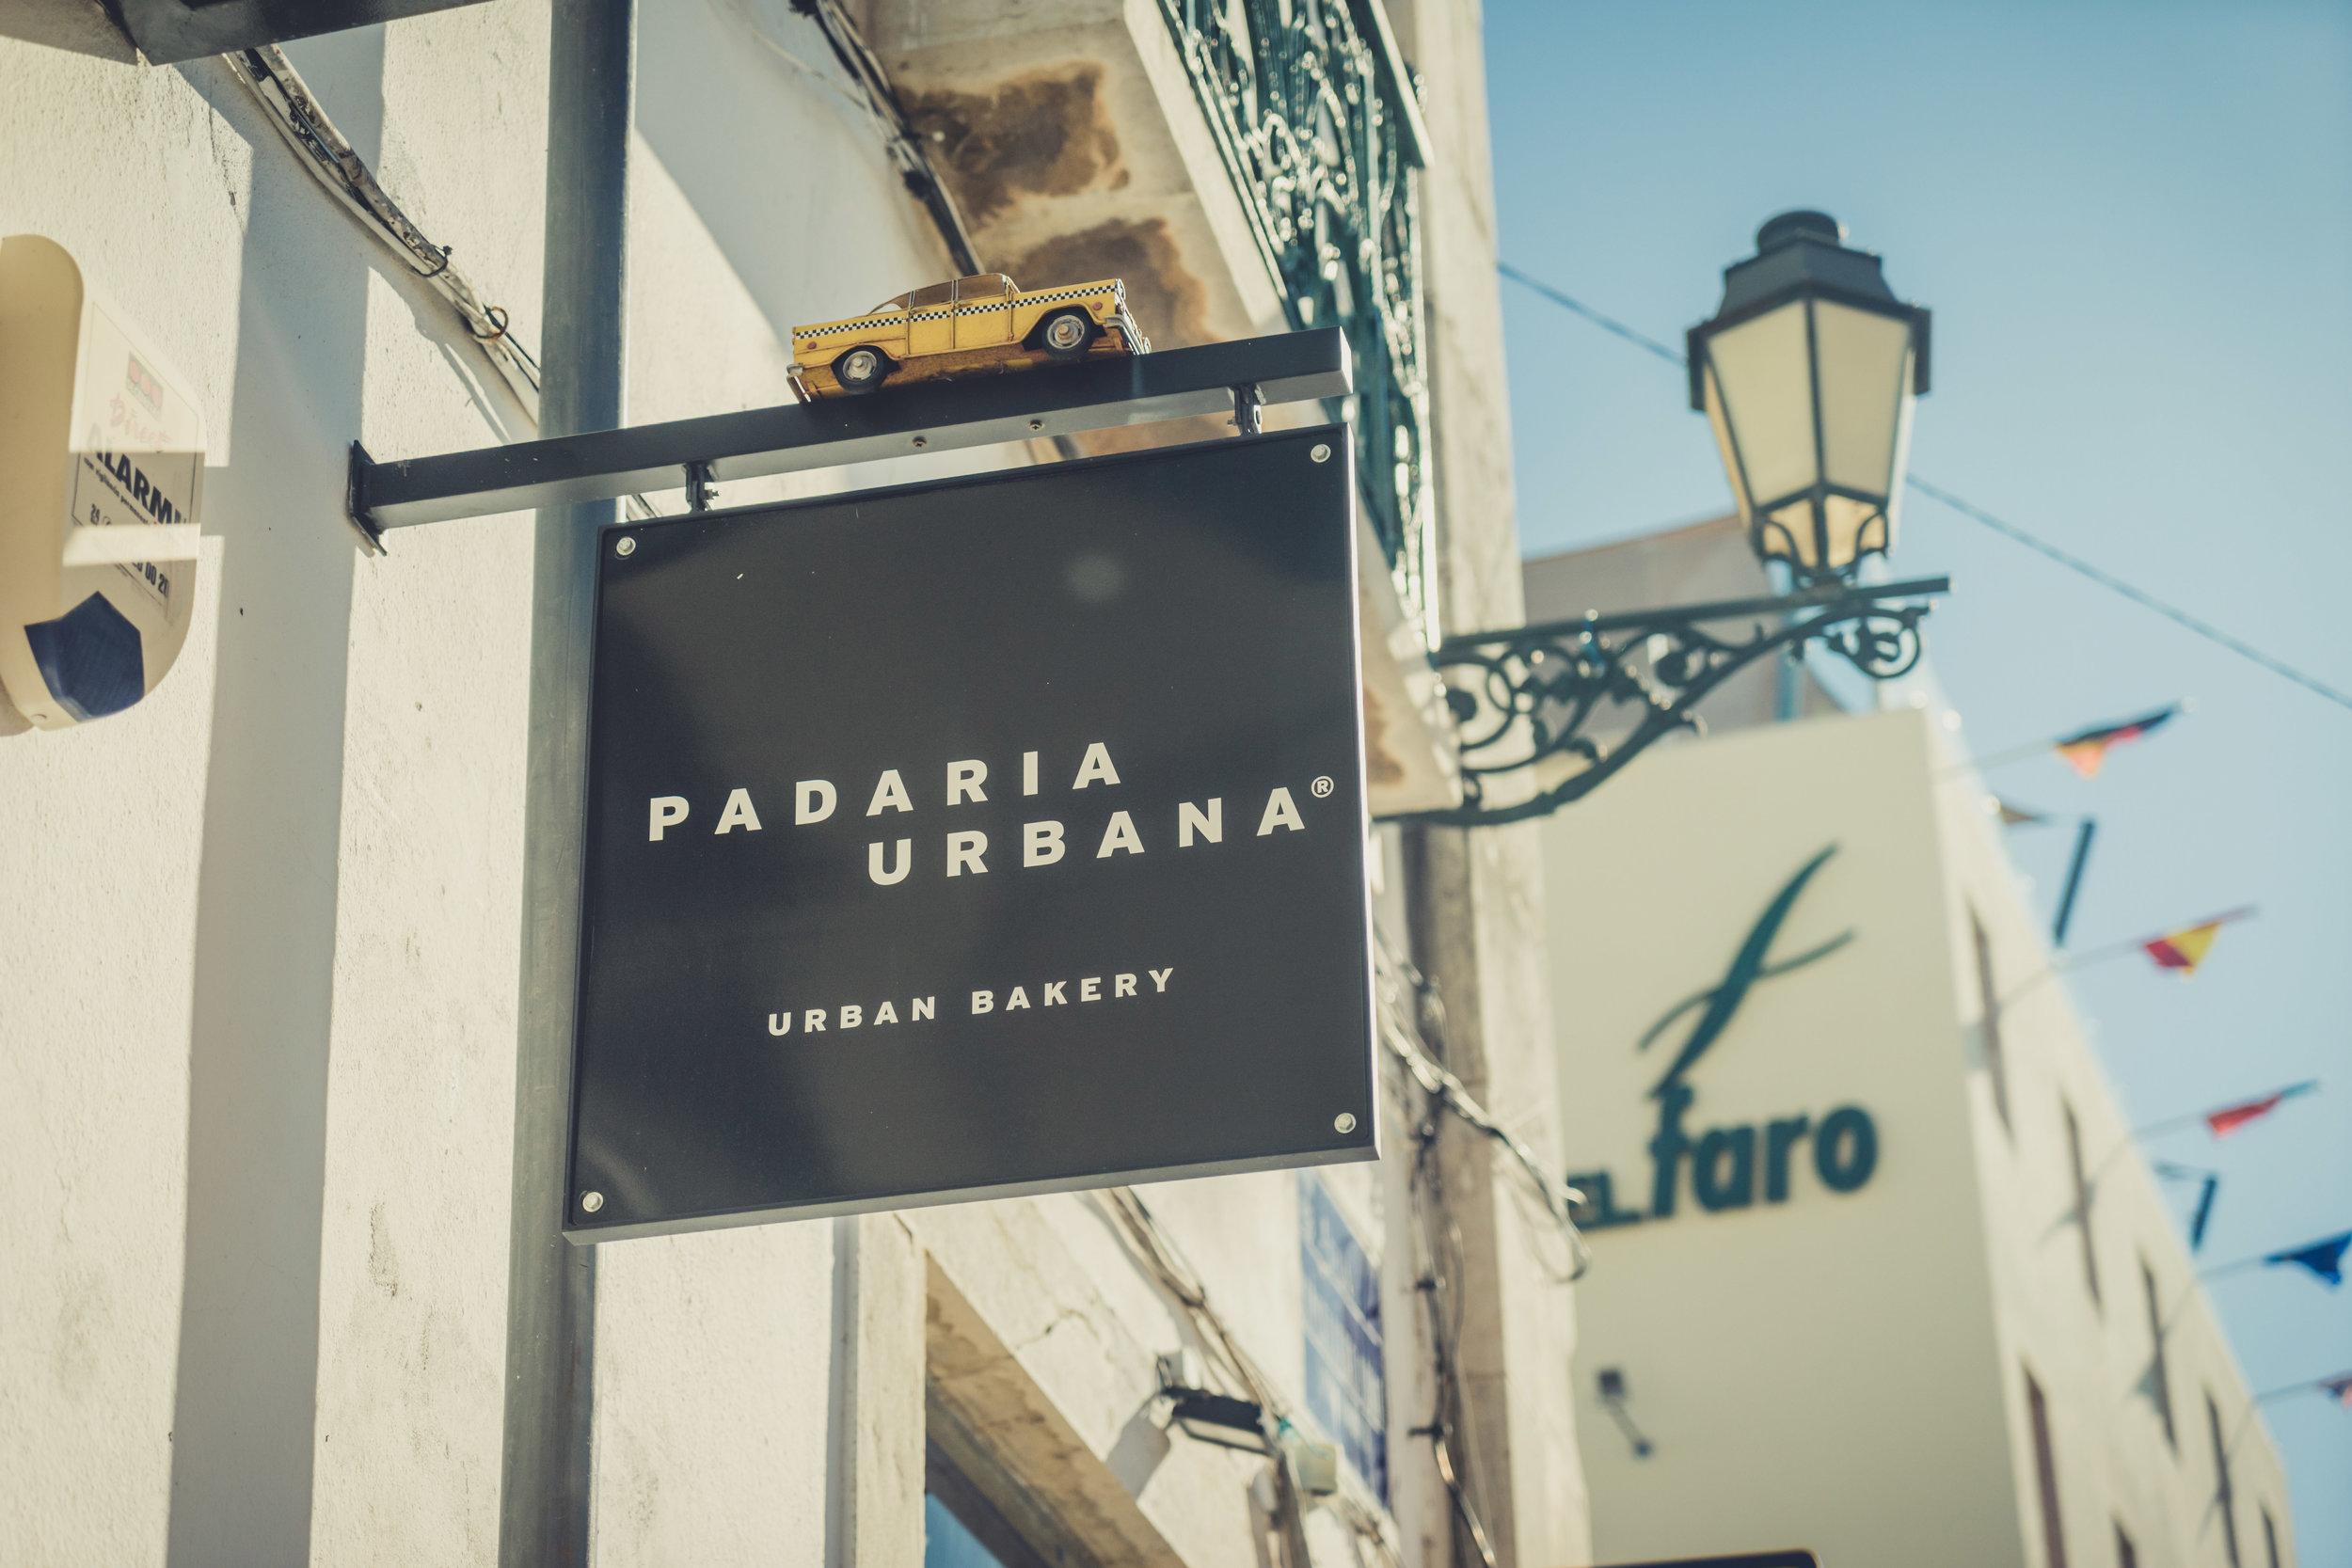 Padaris Urbana. Algarve. Faro. Cake shop.jpg